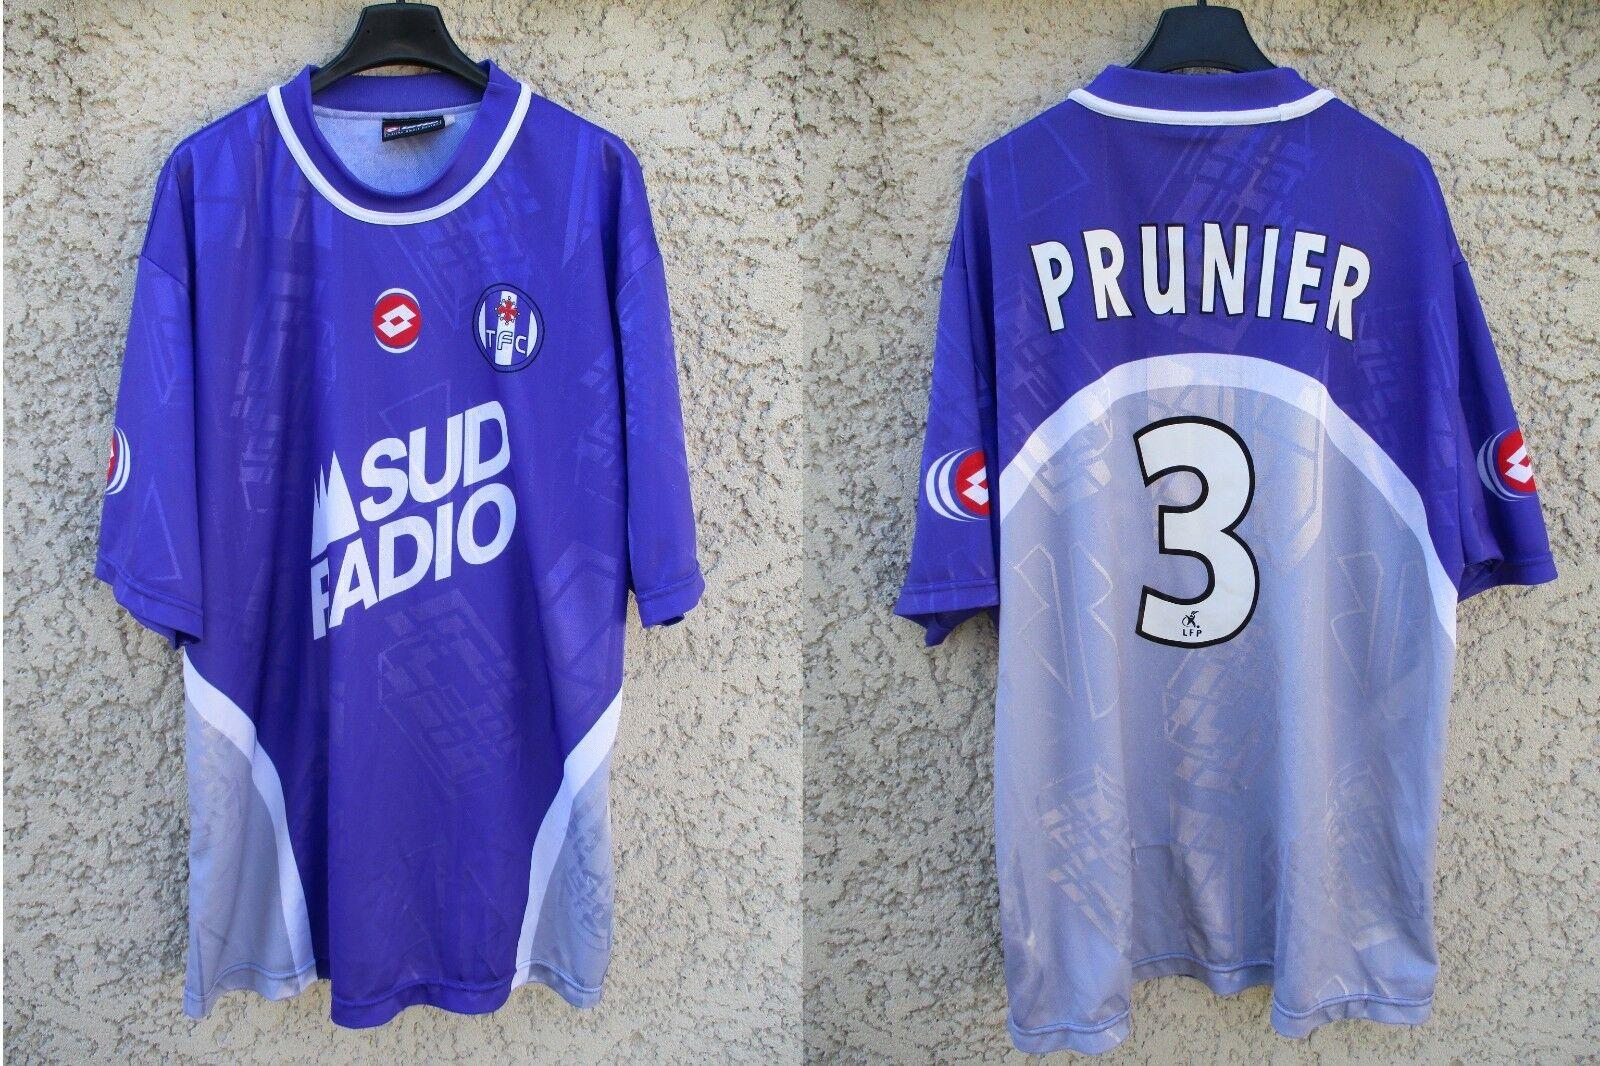 Maillot TOULOUSE F.C William PRUNIER n°3 LOTTO vintage shirt camiseta camiseta camiseta trikot XL cd6b22